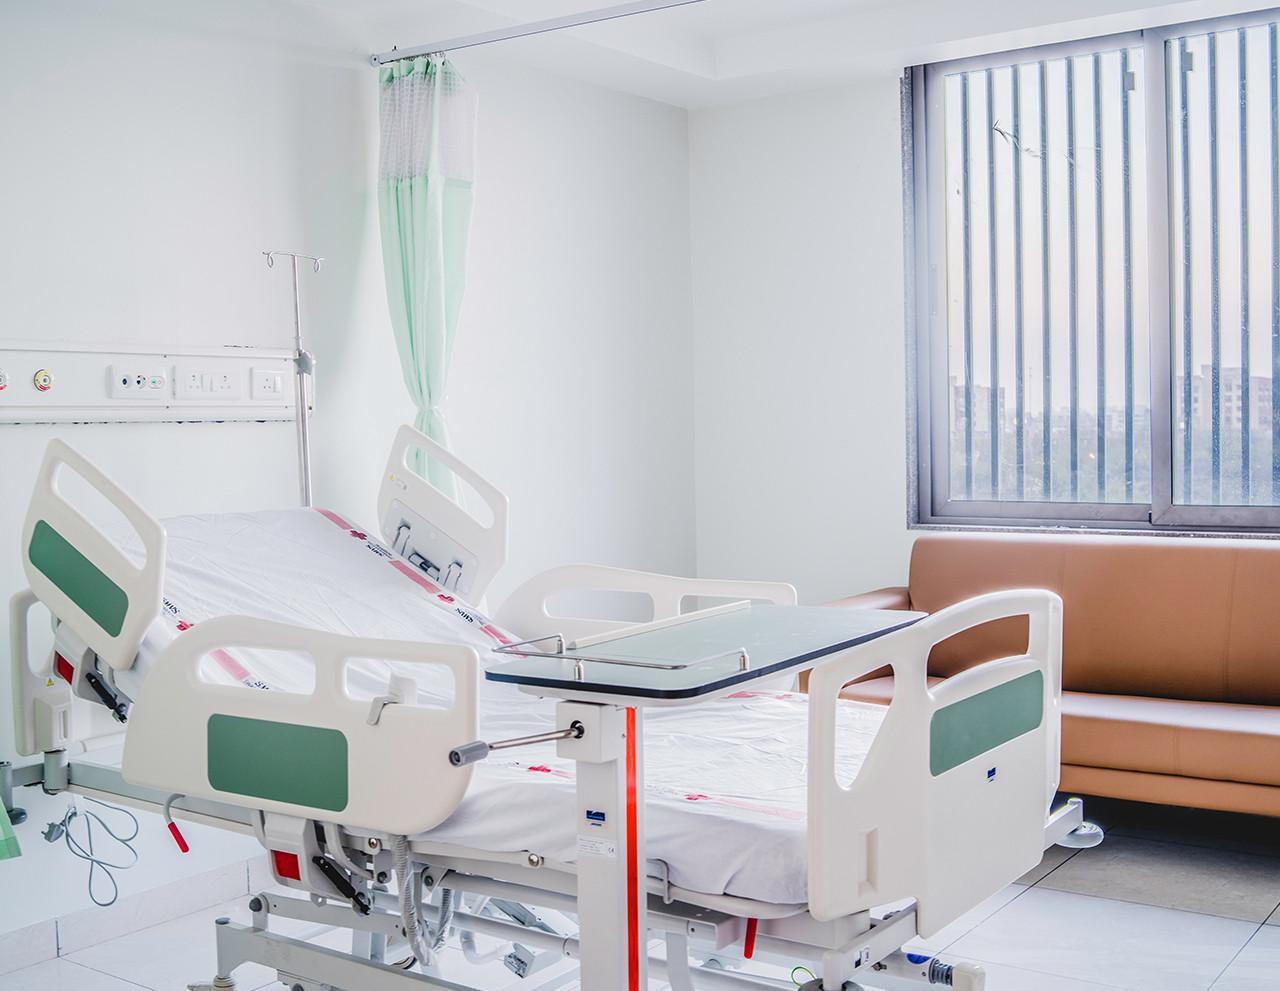 SMVS Hospital_11.jpg